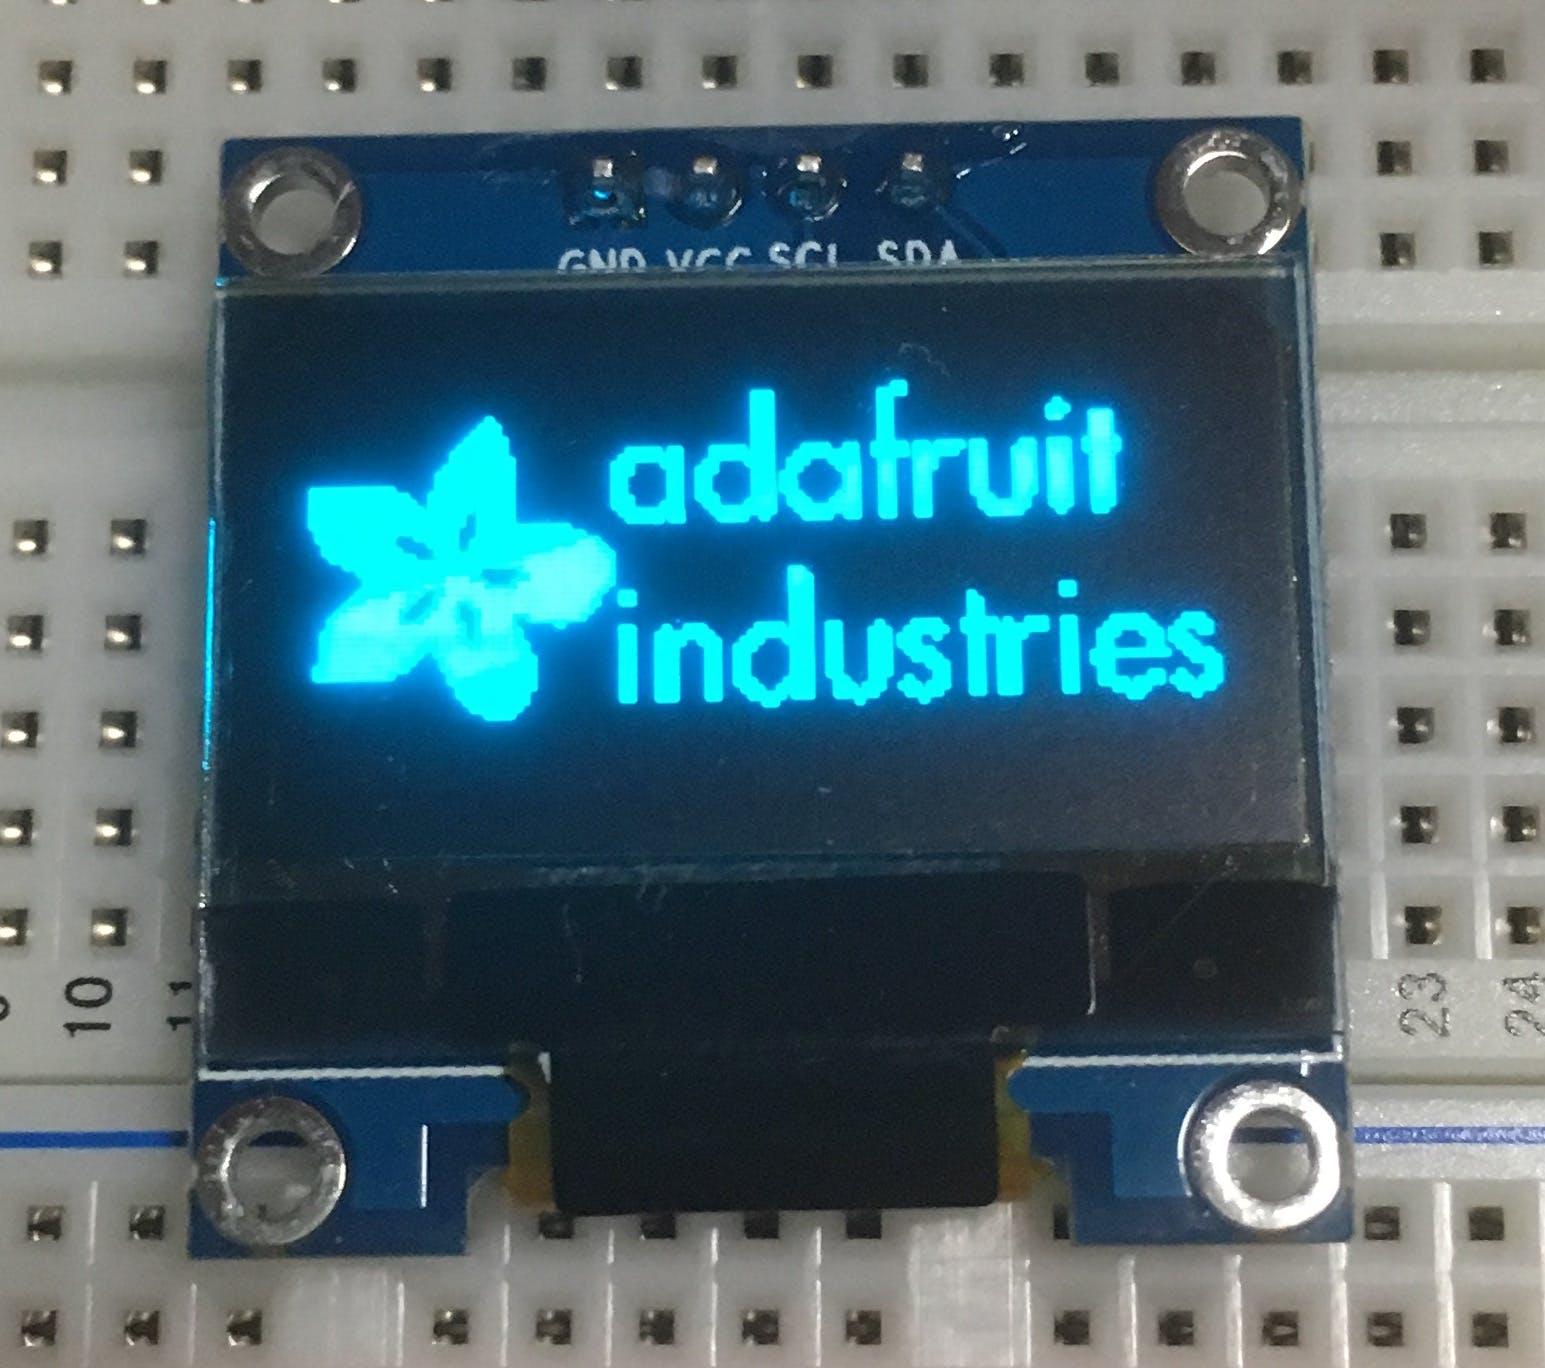 ArduinoでOLEDディスプレイを試す - Qiita